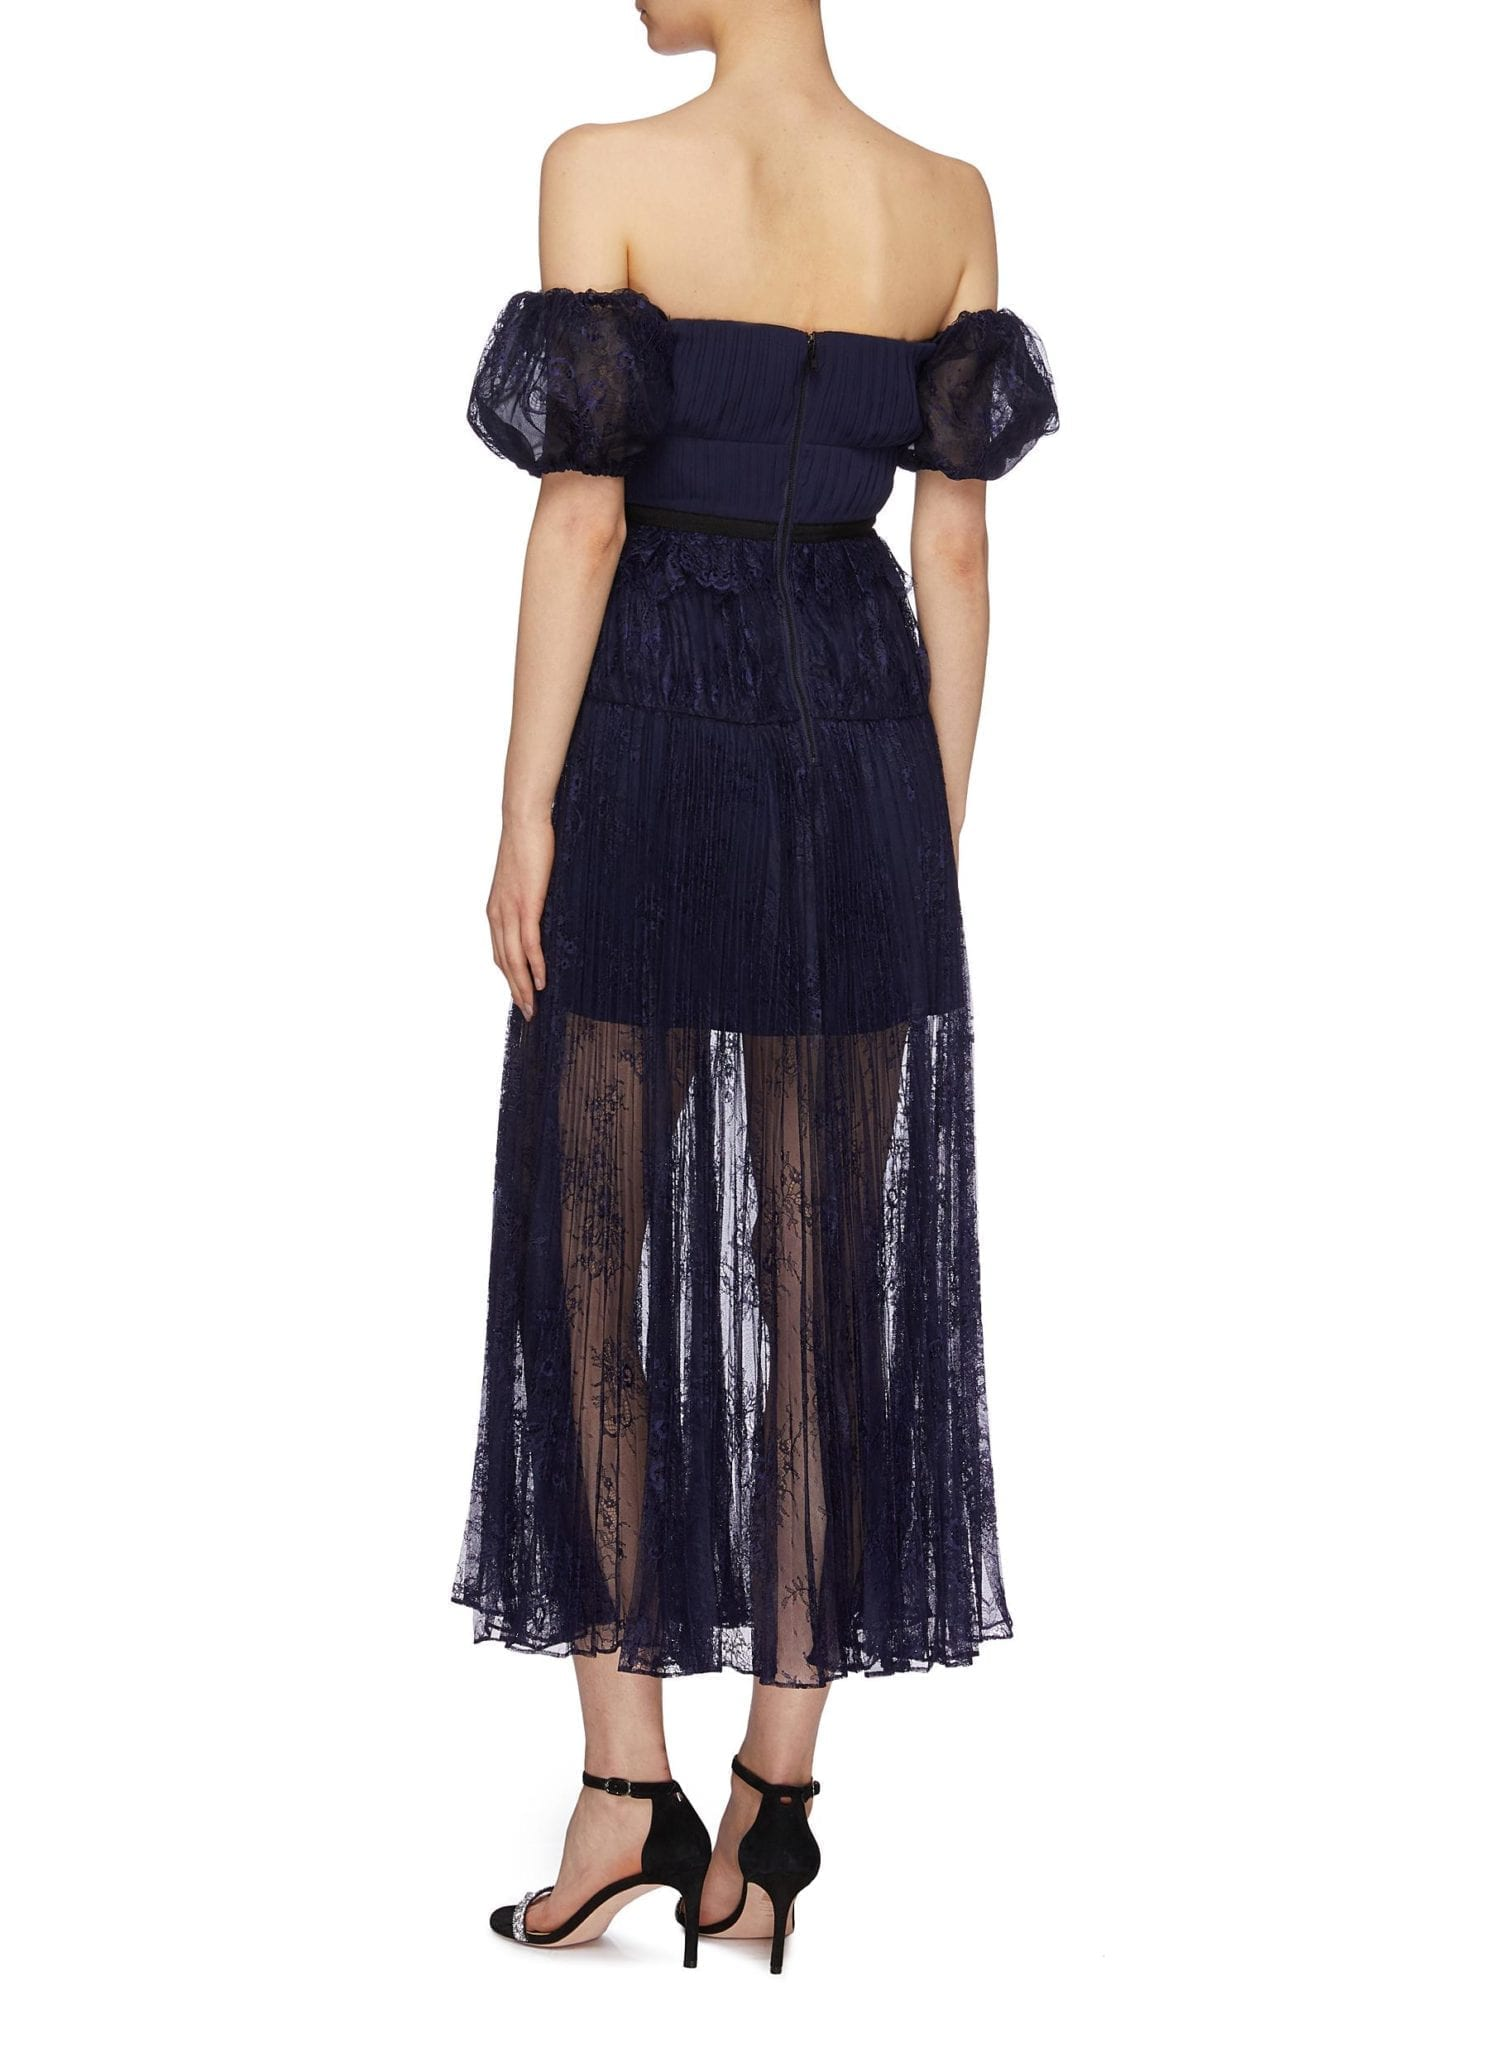 SELF-PORTRAIT Pleated Chantilly Lace Off-shoulder Dress